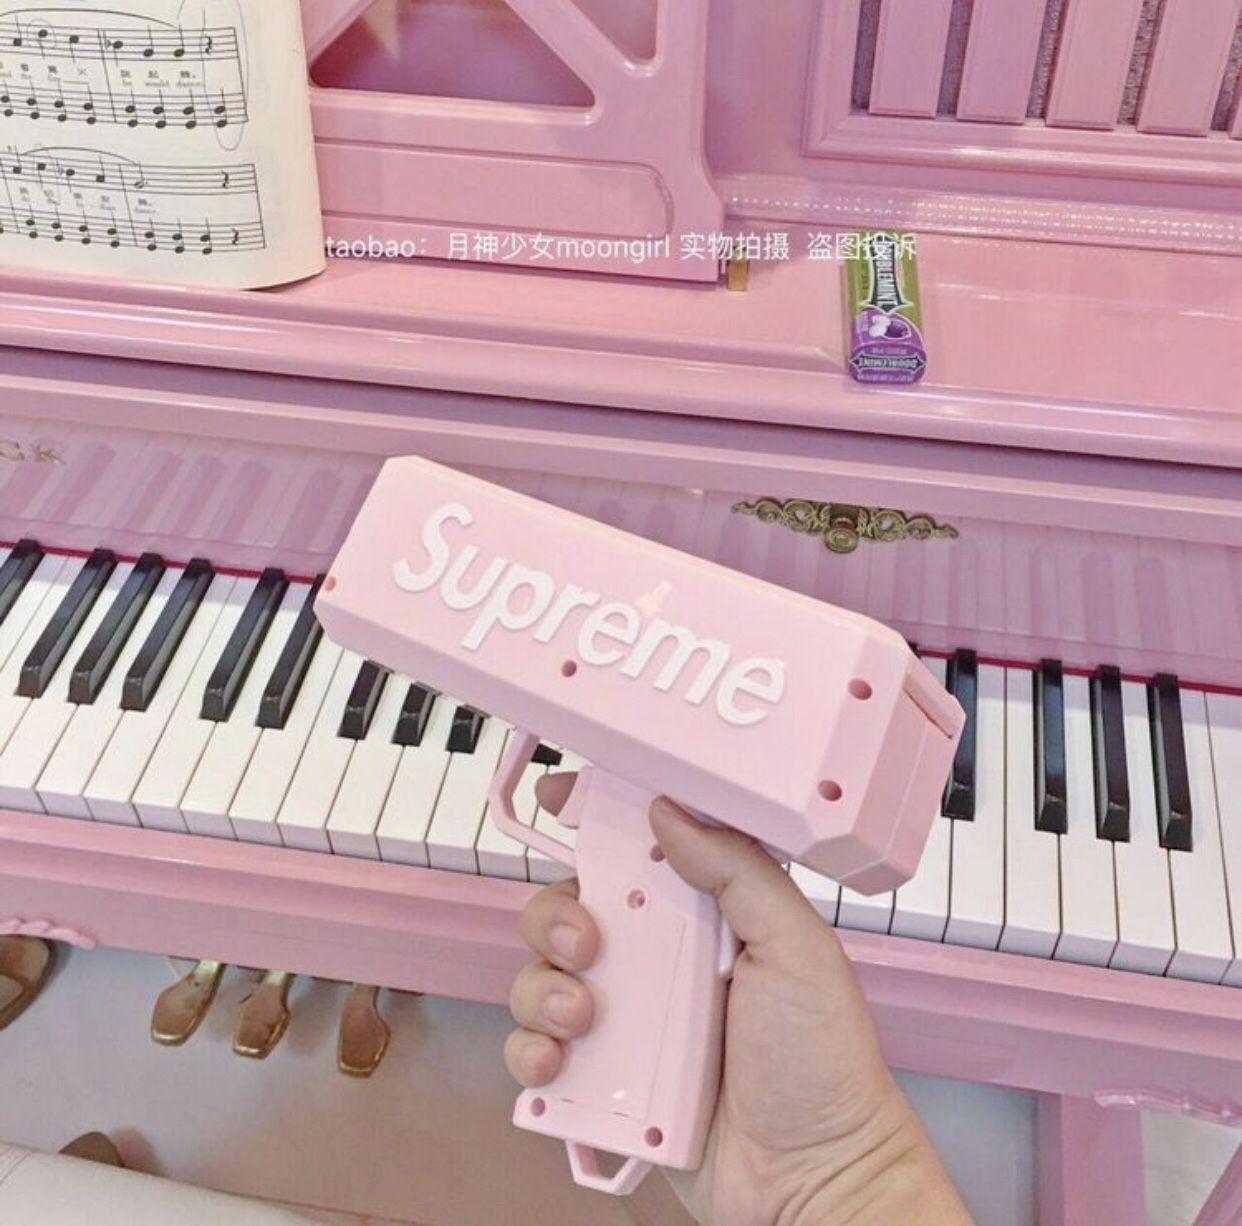 Baddie Cute Pink Badbitch Pastel Pink Aesthetic Pink Themes Pink Aesthetic